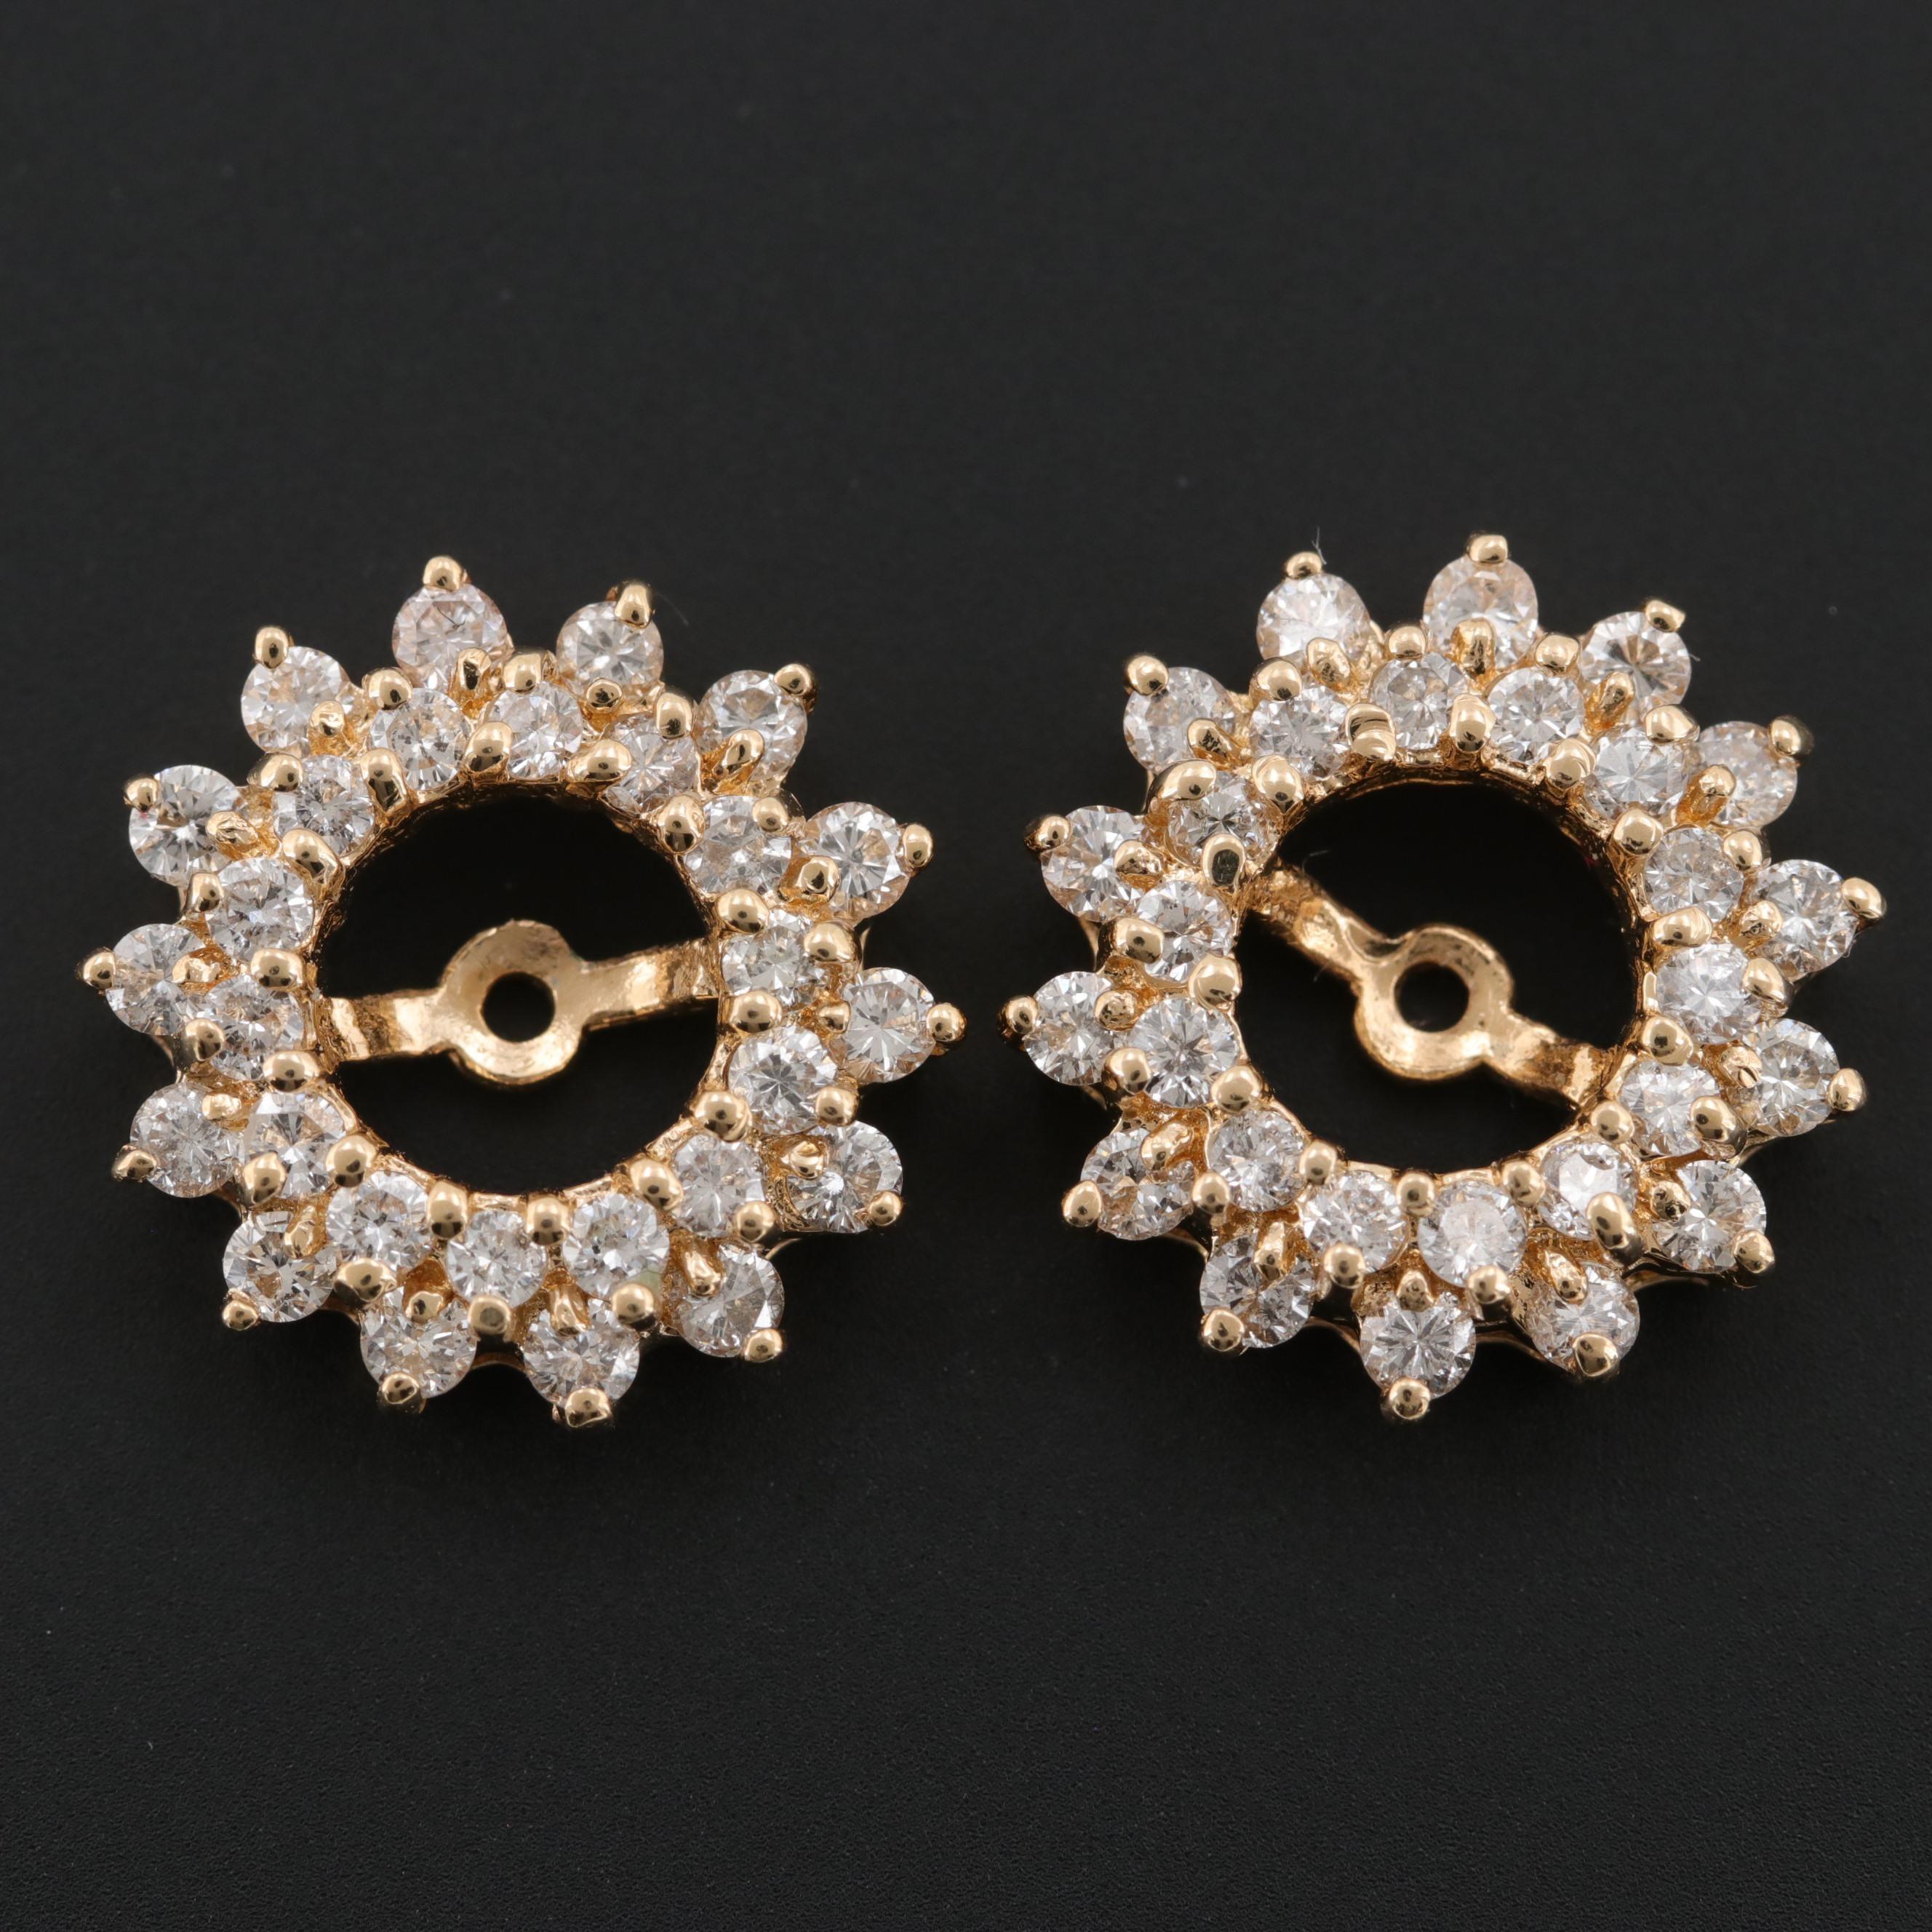 14K Yellow Gold 1.33 CTW Diamond Earring Jackets